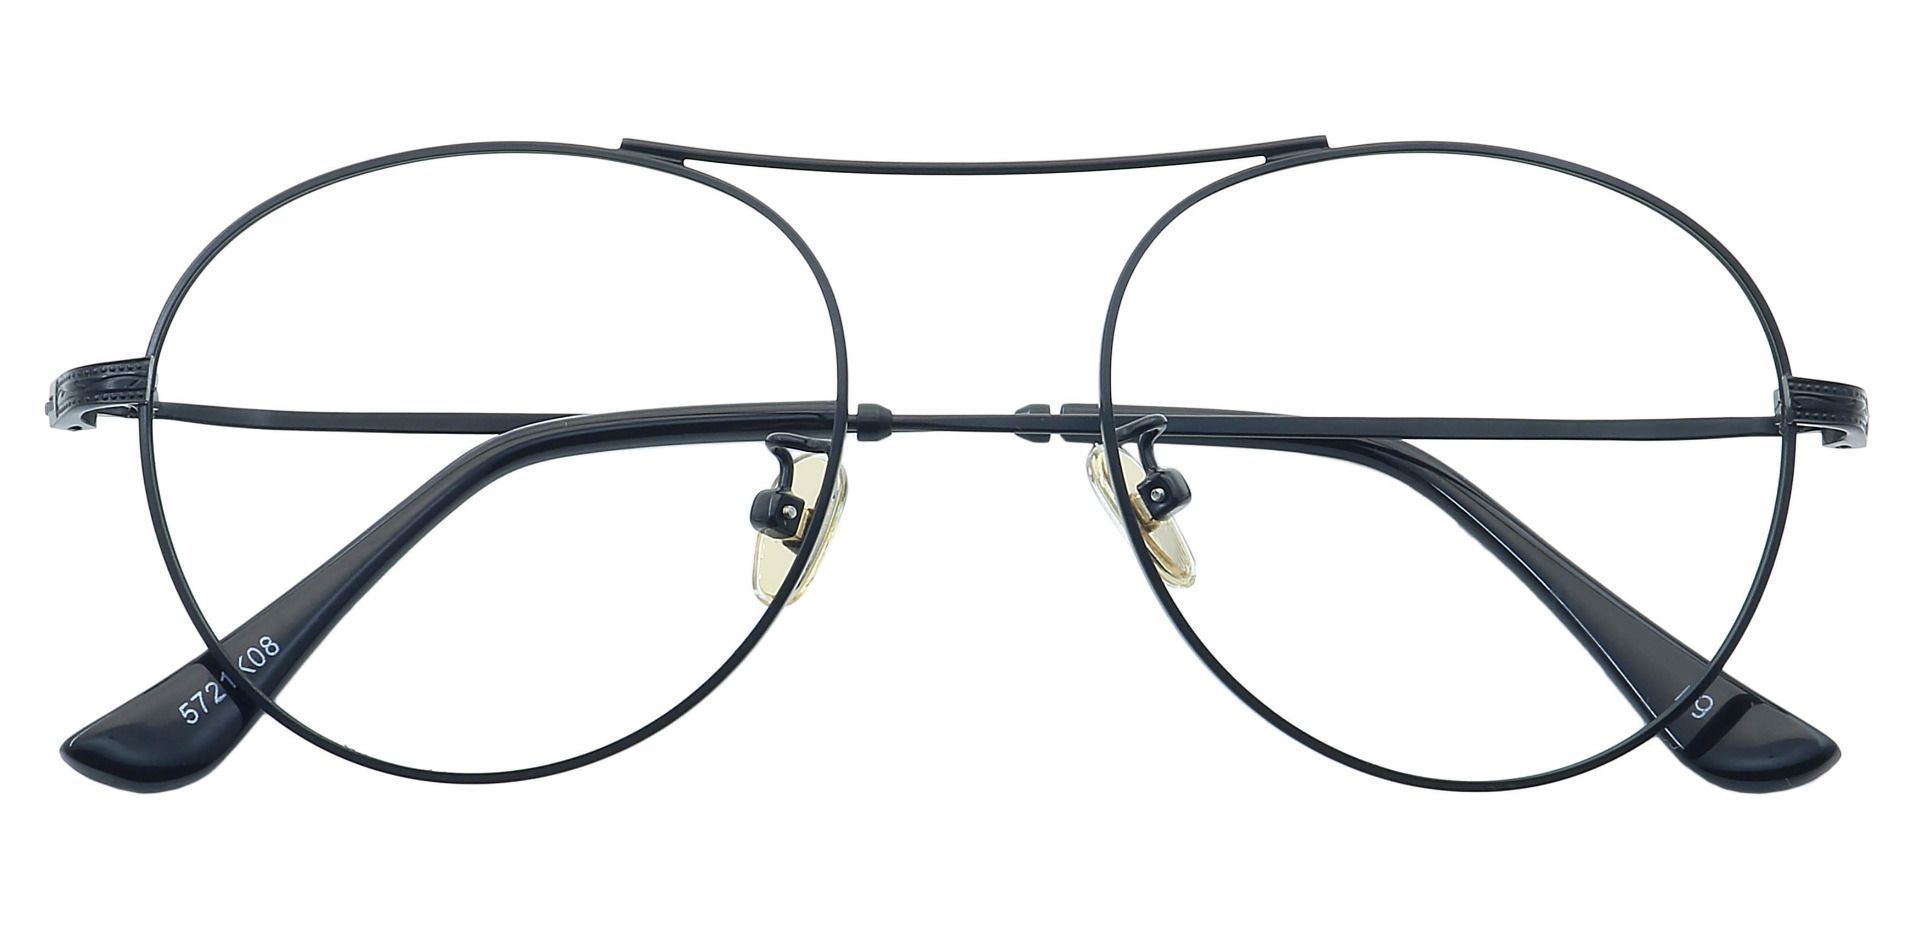 Finn Round Prescription Glasses - Black